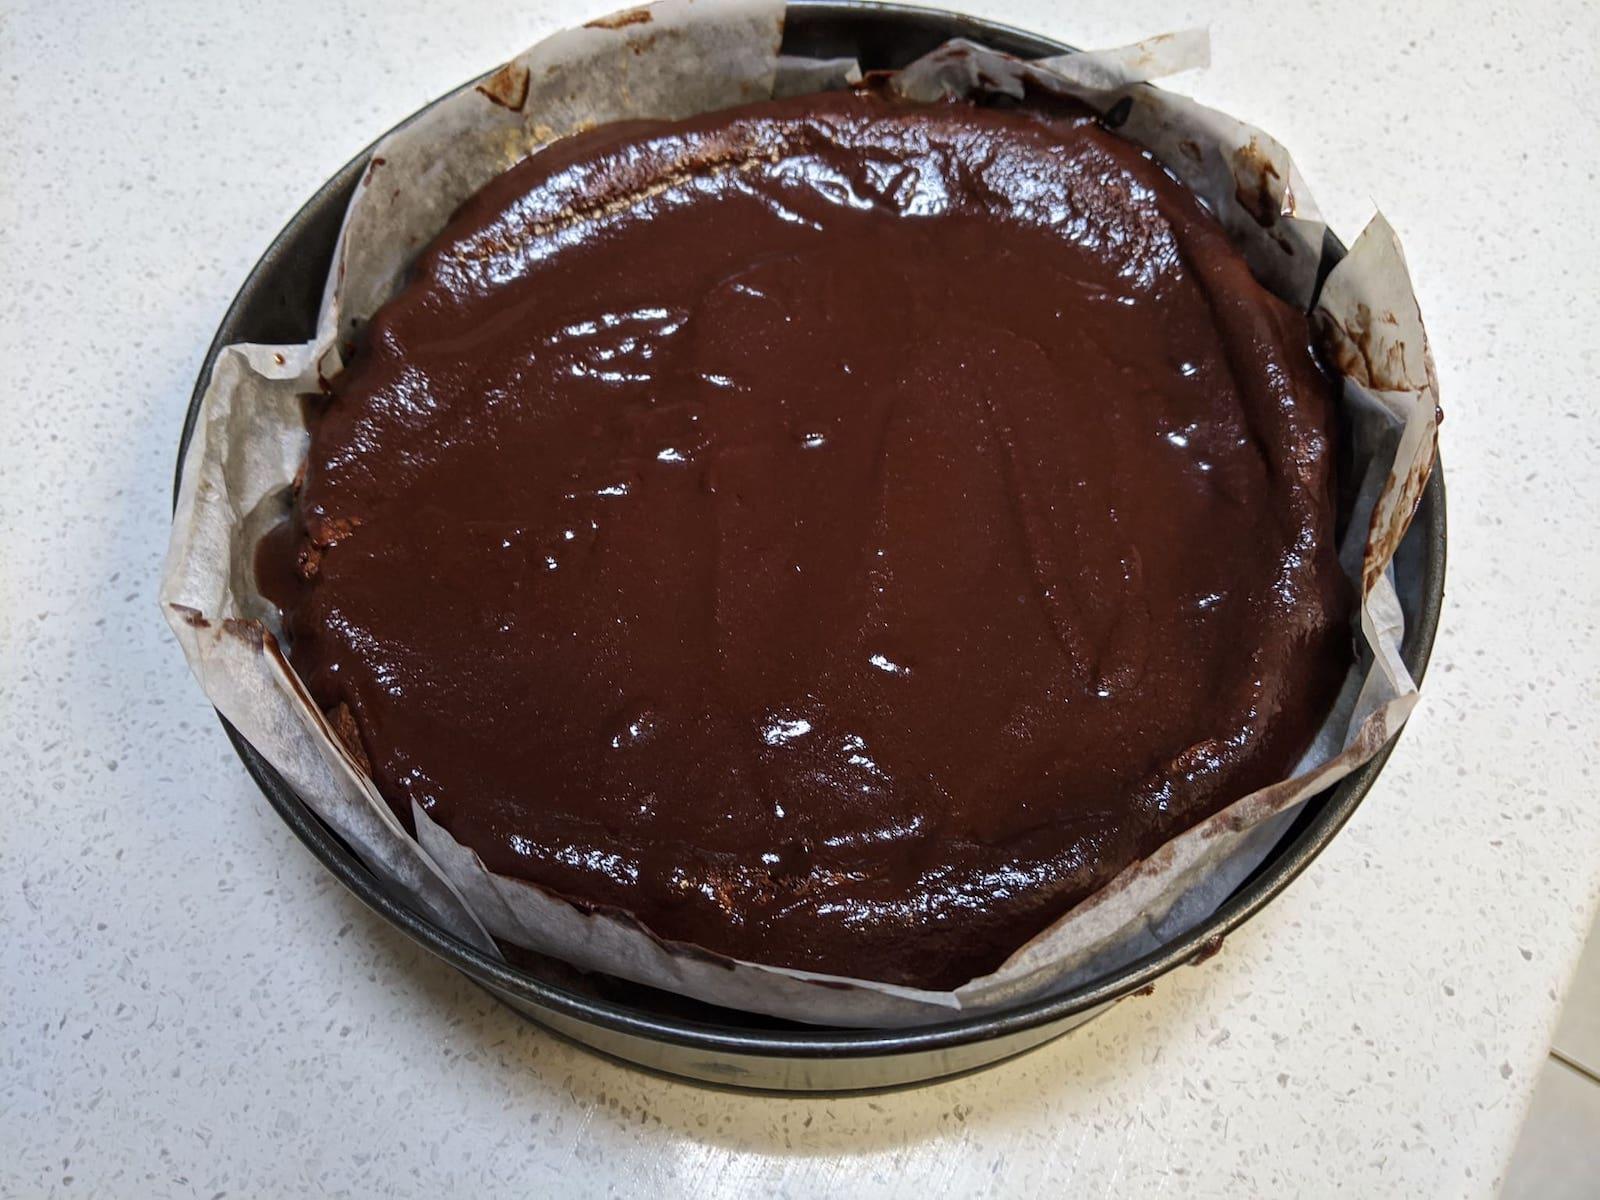 Tartine chocolate soufflé cake with ganache poured over it